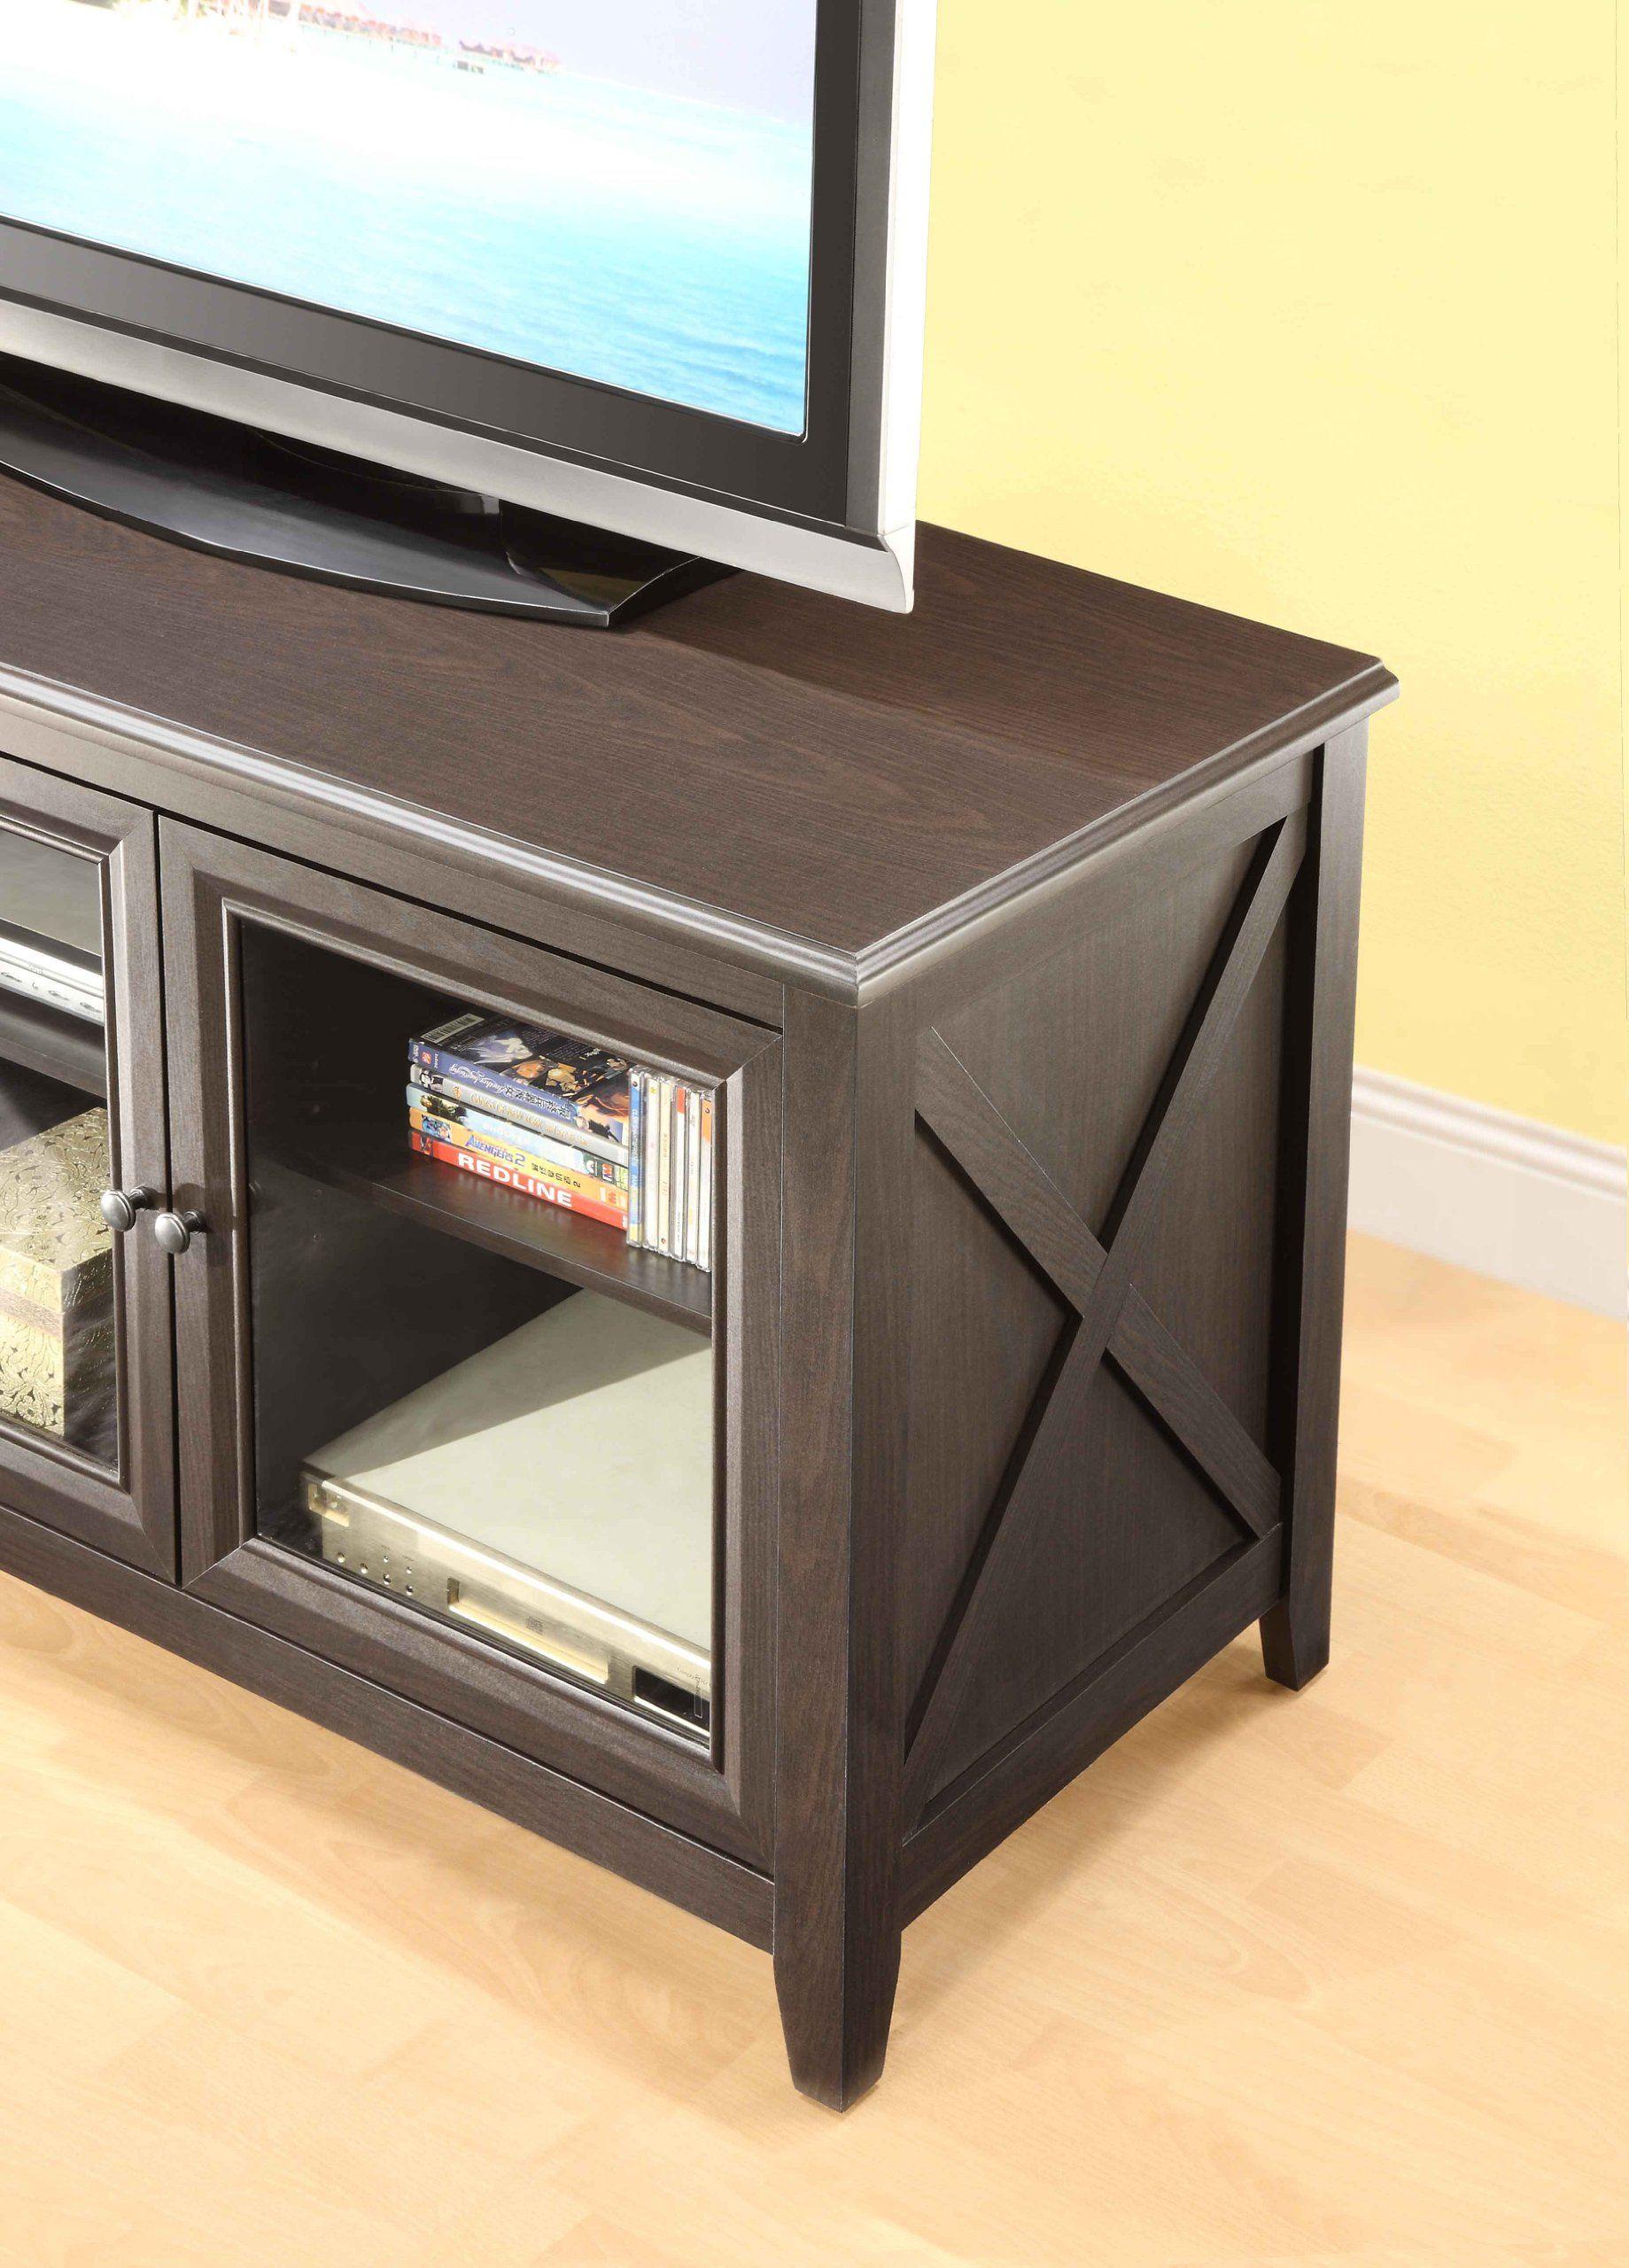 Amazon Com Whalen Furniture Avh 1 High Television Console 44 Inch Television Stands Whalen Furniture Home Office Decor Television Console